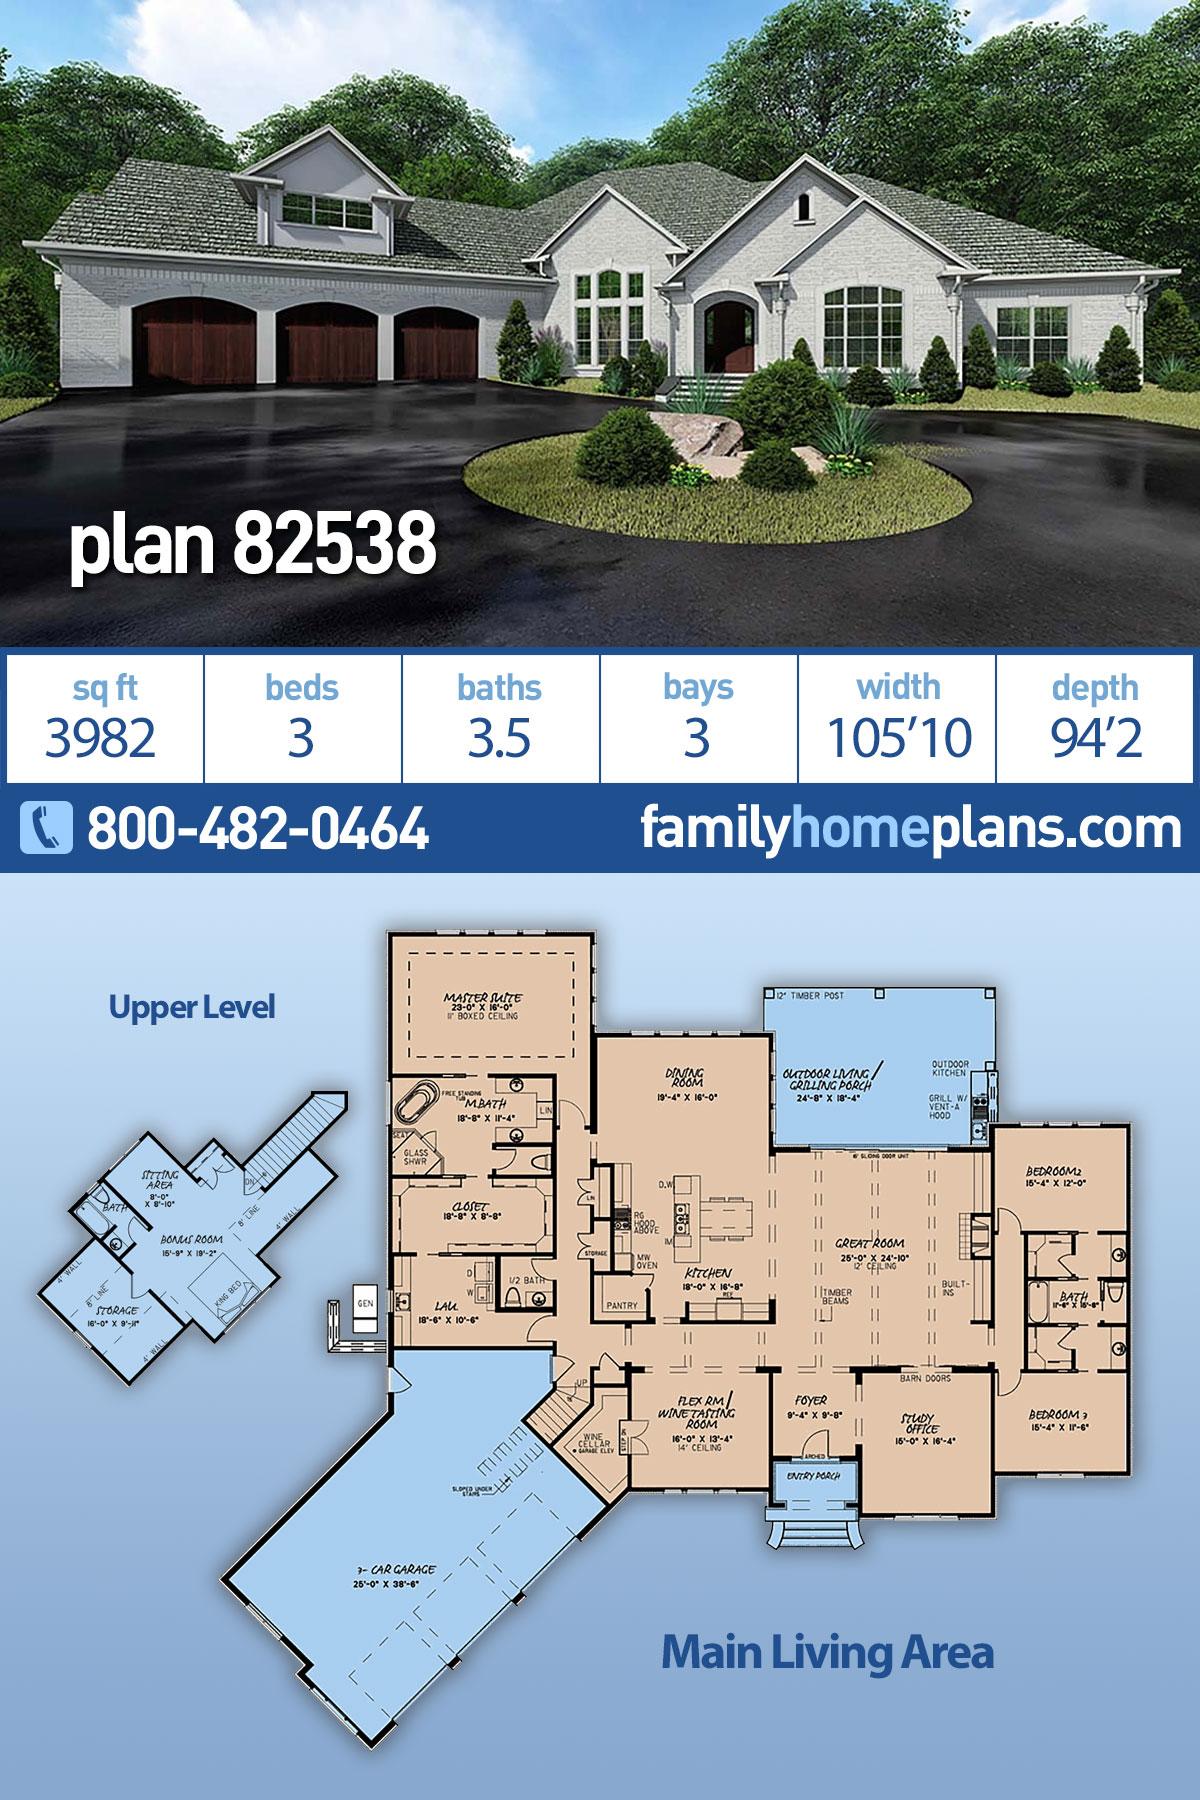 Bungalow, Craftsman, European House Plan 82538 with 3 Beds, 4 Baths, 3 Car Garage